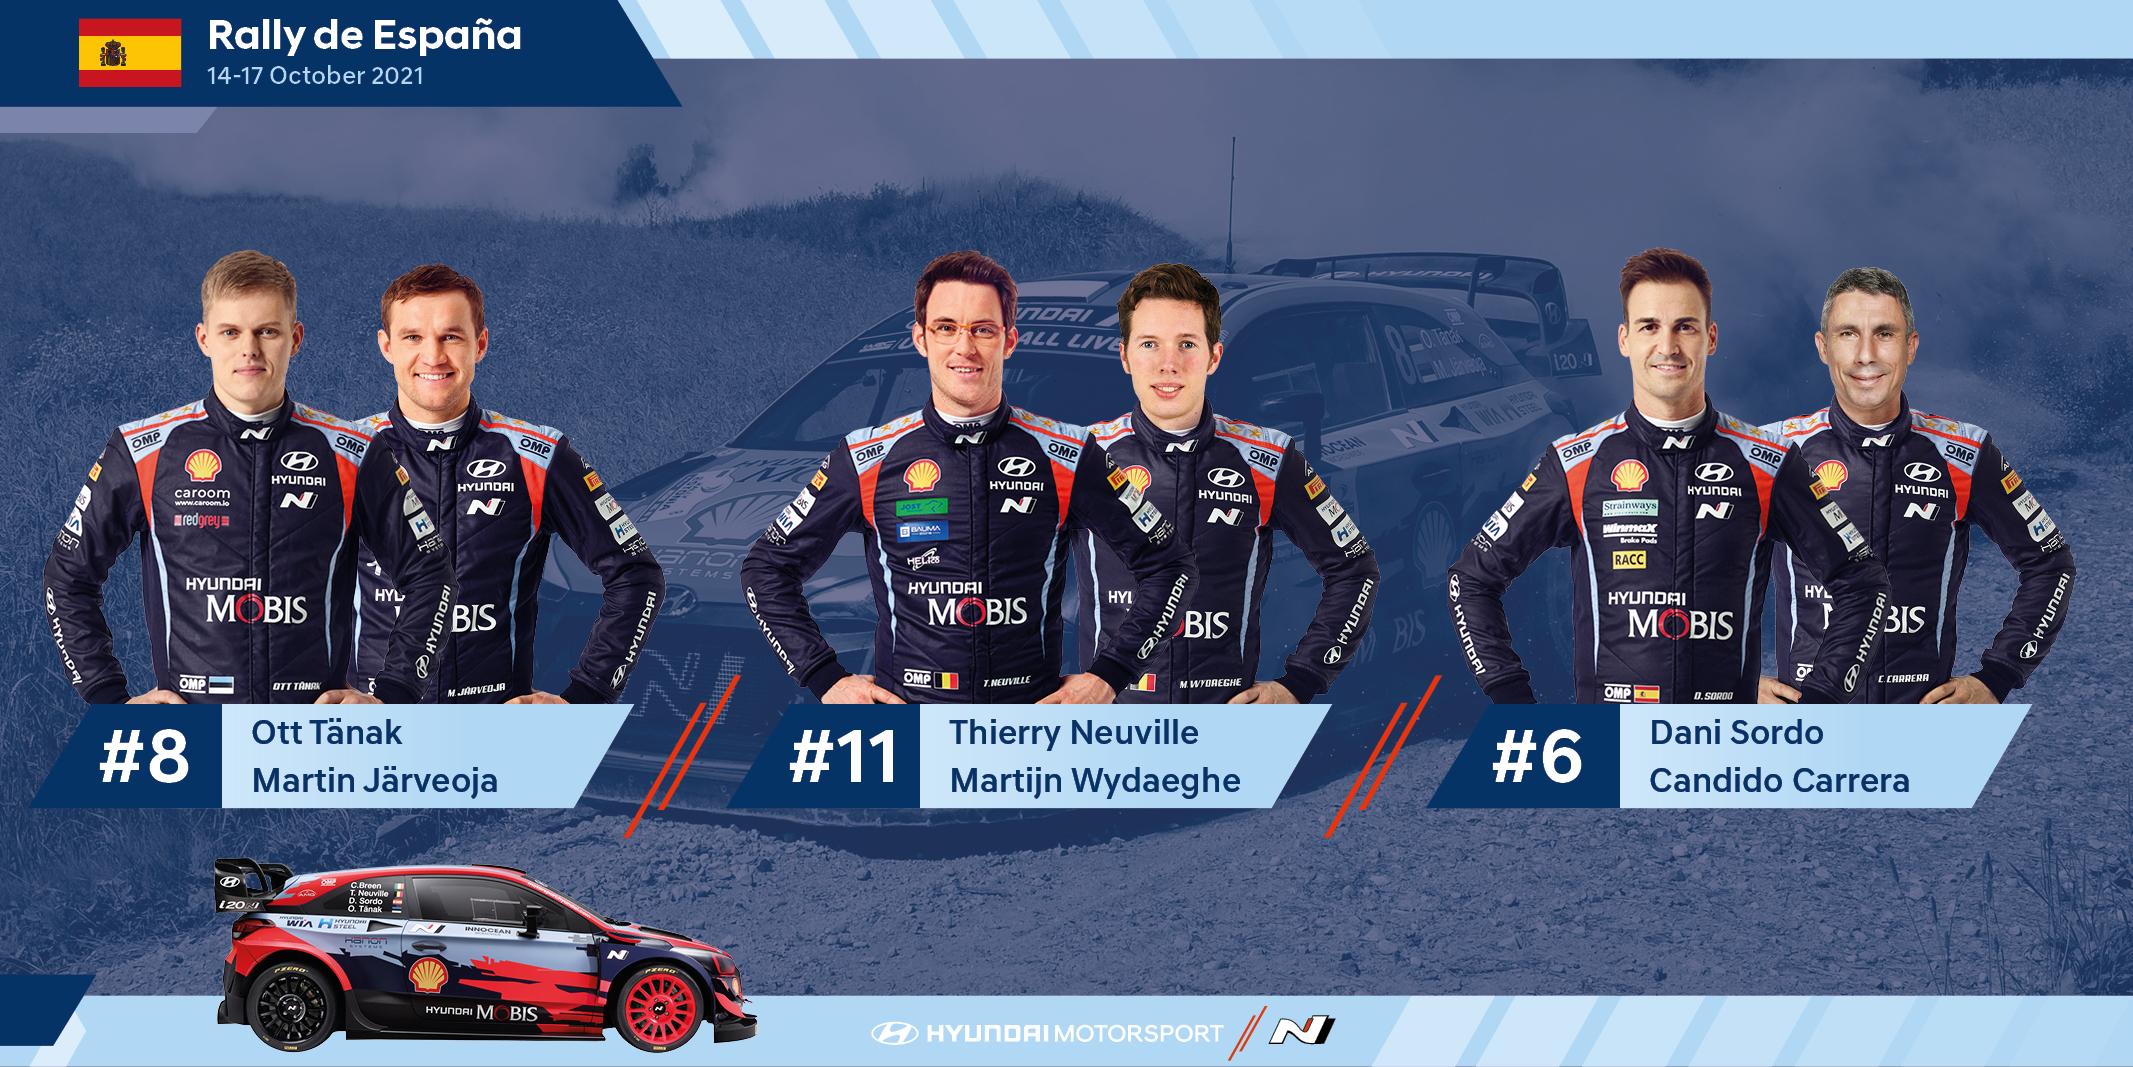 World Rally Championship: Temporada 2021  - Página 35 E-6dzYHXsA0jYKA?format=jpg&name=4096x4096